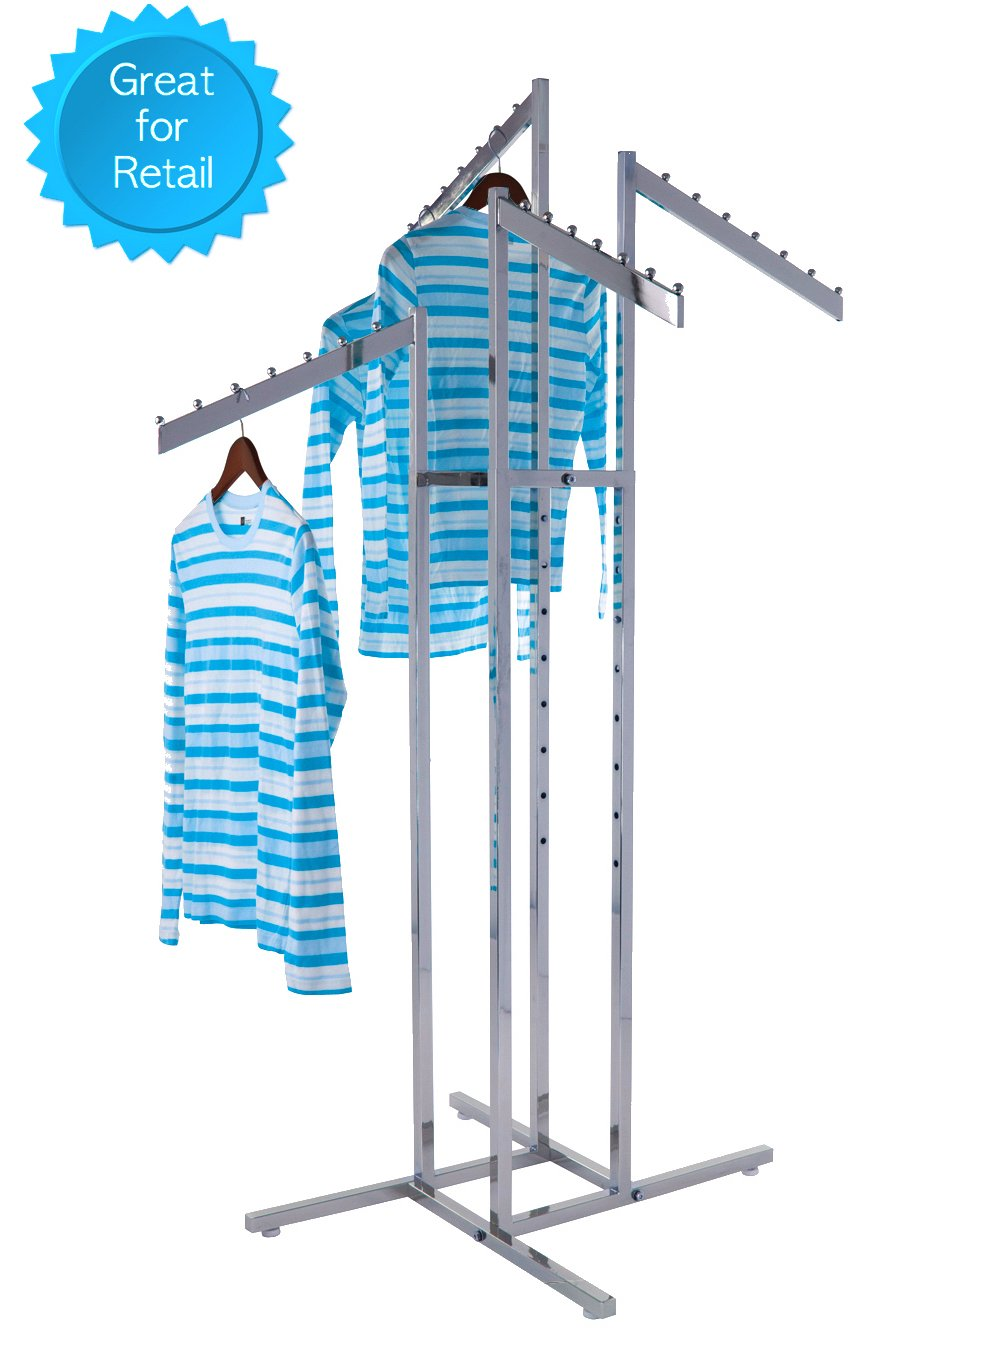 Only Garment Racks - Heavy Duty Chrome 4 Way Rectangular Arm Clothing Rack, Adjustable Height Waterfall Arm Garment Rack, Perfect for Retail Clothing Store Display - Rectangular Tubing Slant Arms